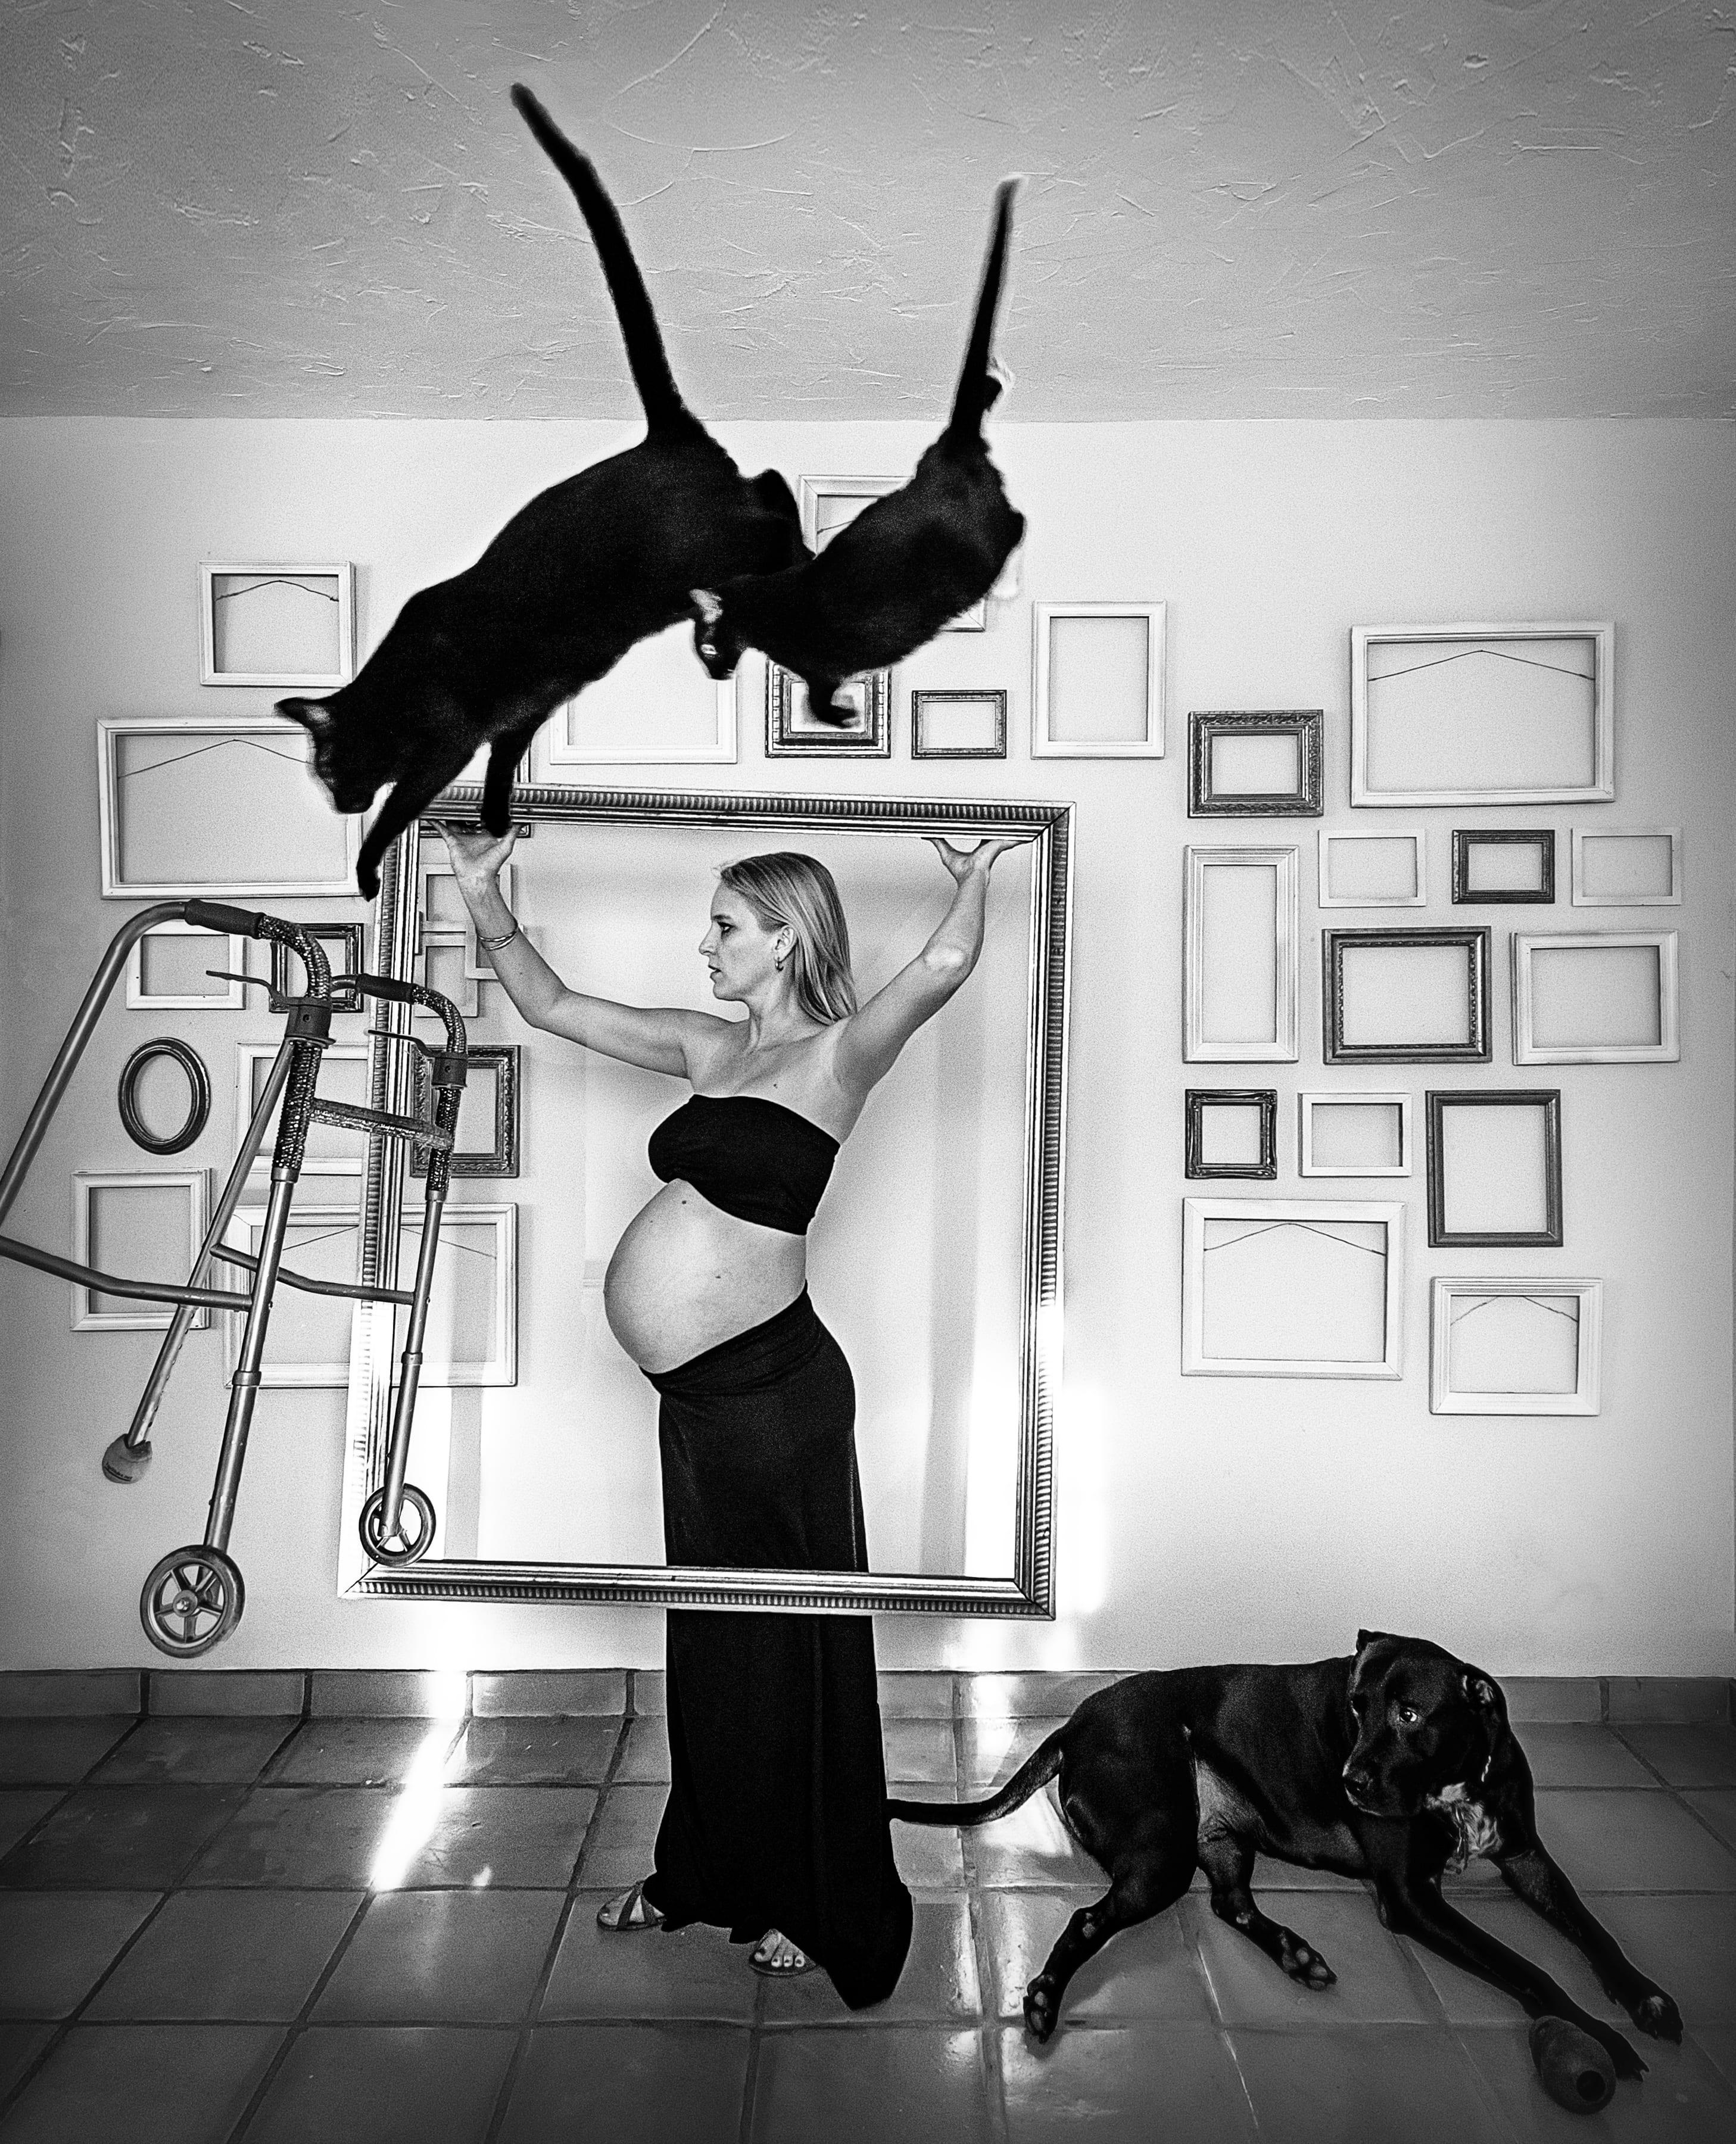 LaRae Lobdell maternity portrait selfie week #35, Miami FL, September 19th, 2016